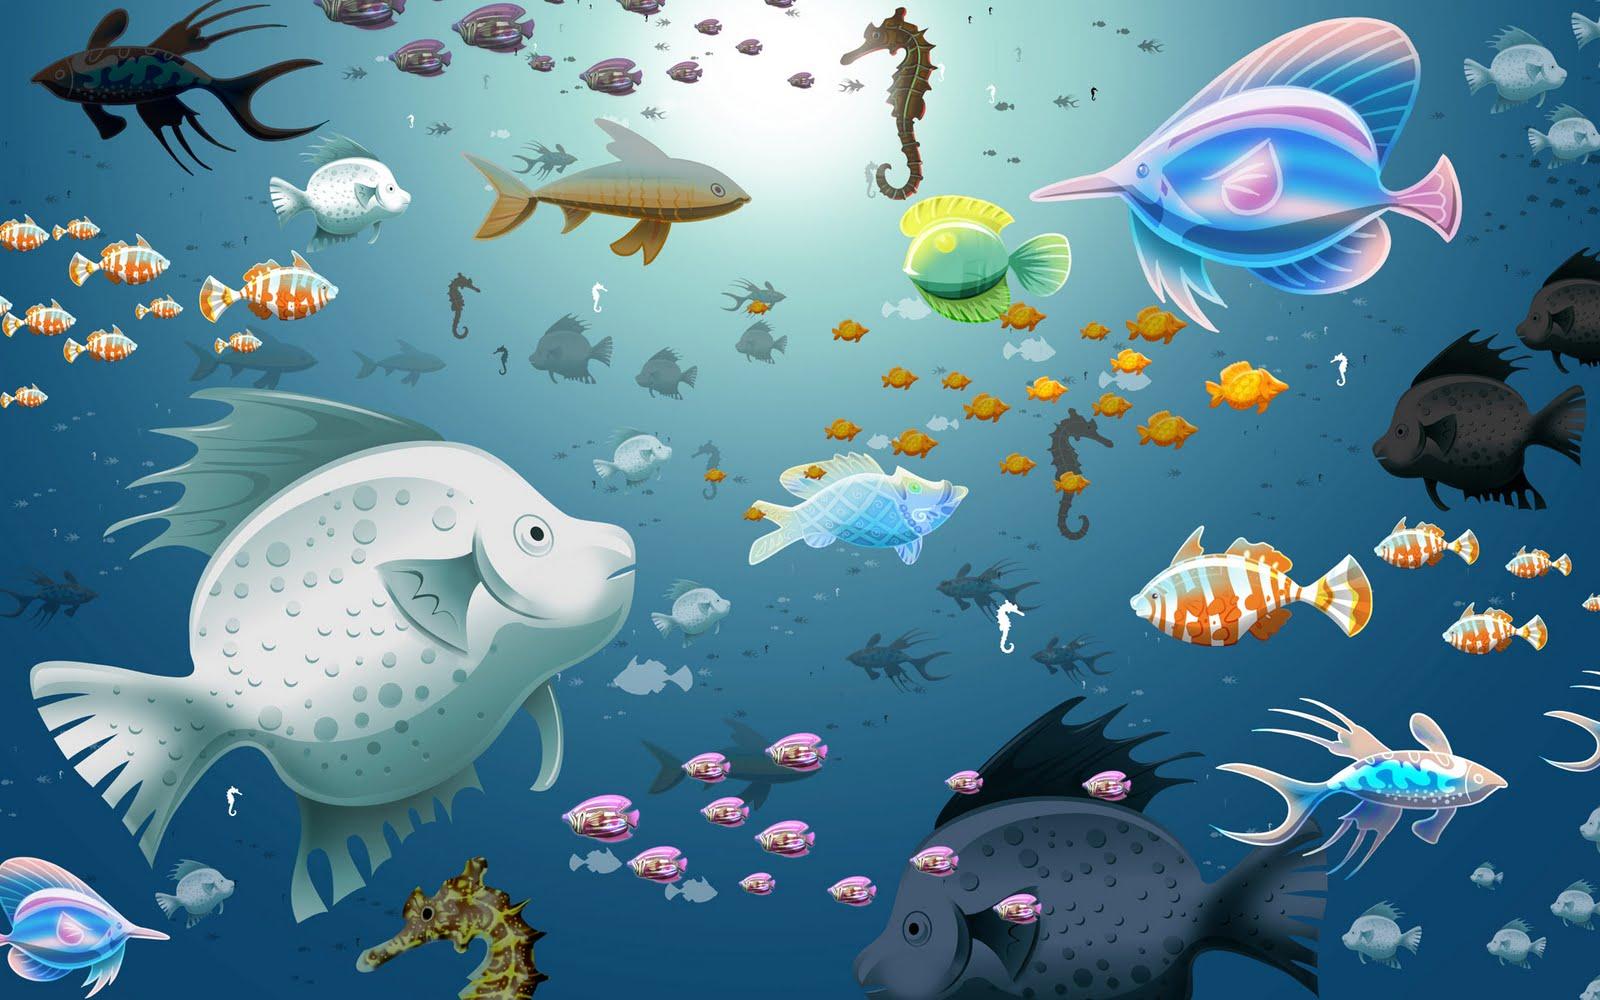 http://4.bp.blogspot.com/-2oYgYLMIf5U/Tlaja_z1OYI/AAAAAAAACiA/sWttu-b49Q0/s1600/Fish+wallpaper4.jpg